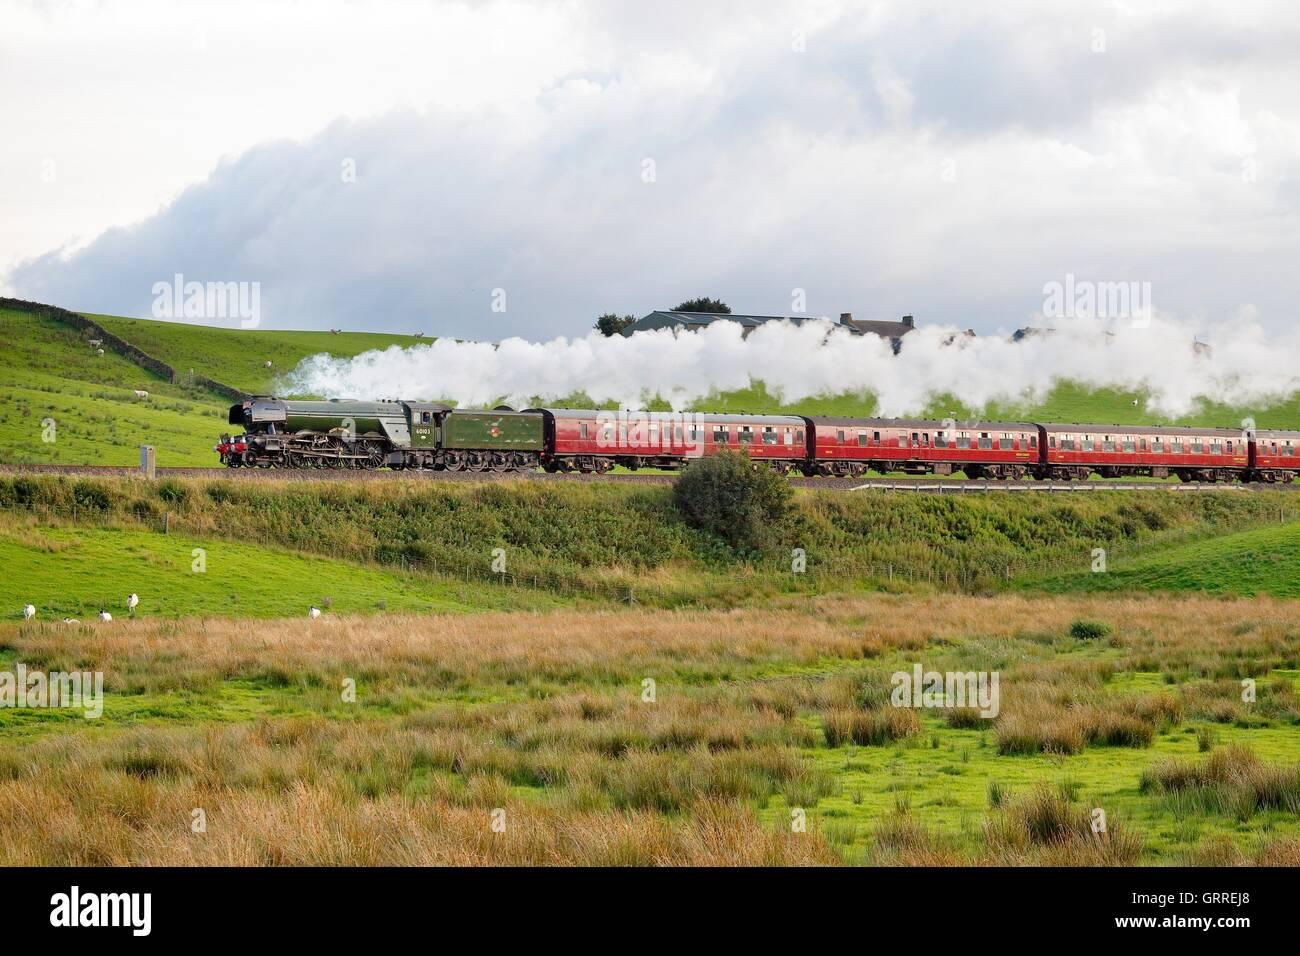 Flying Scotsman steam train on an embankment. Gilsland, Newcastle & Carlisle Railway (N&CR), Cumbria, England, - Stock Image